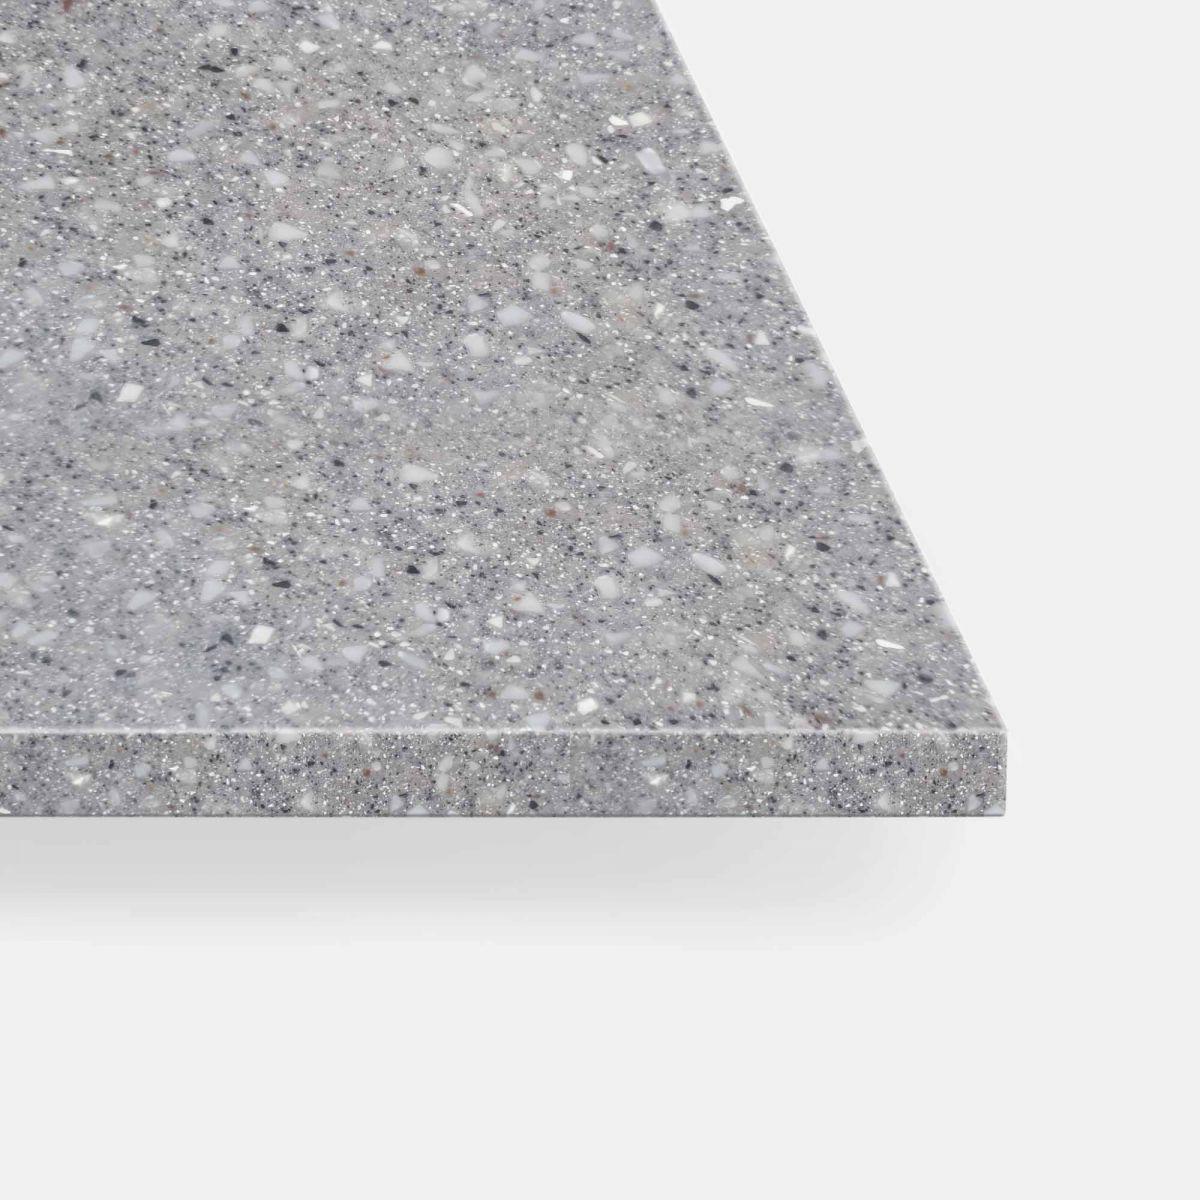 Peak Stone Kordura Top